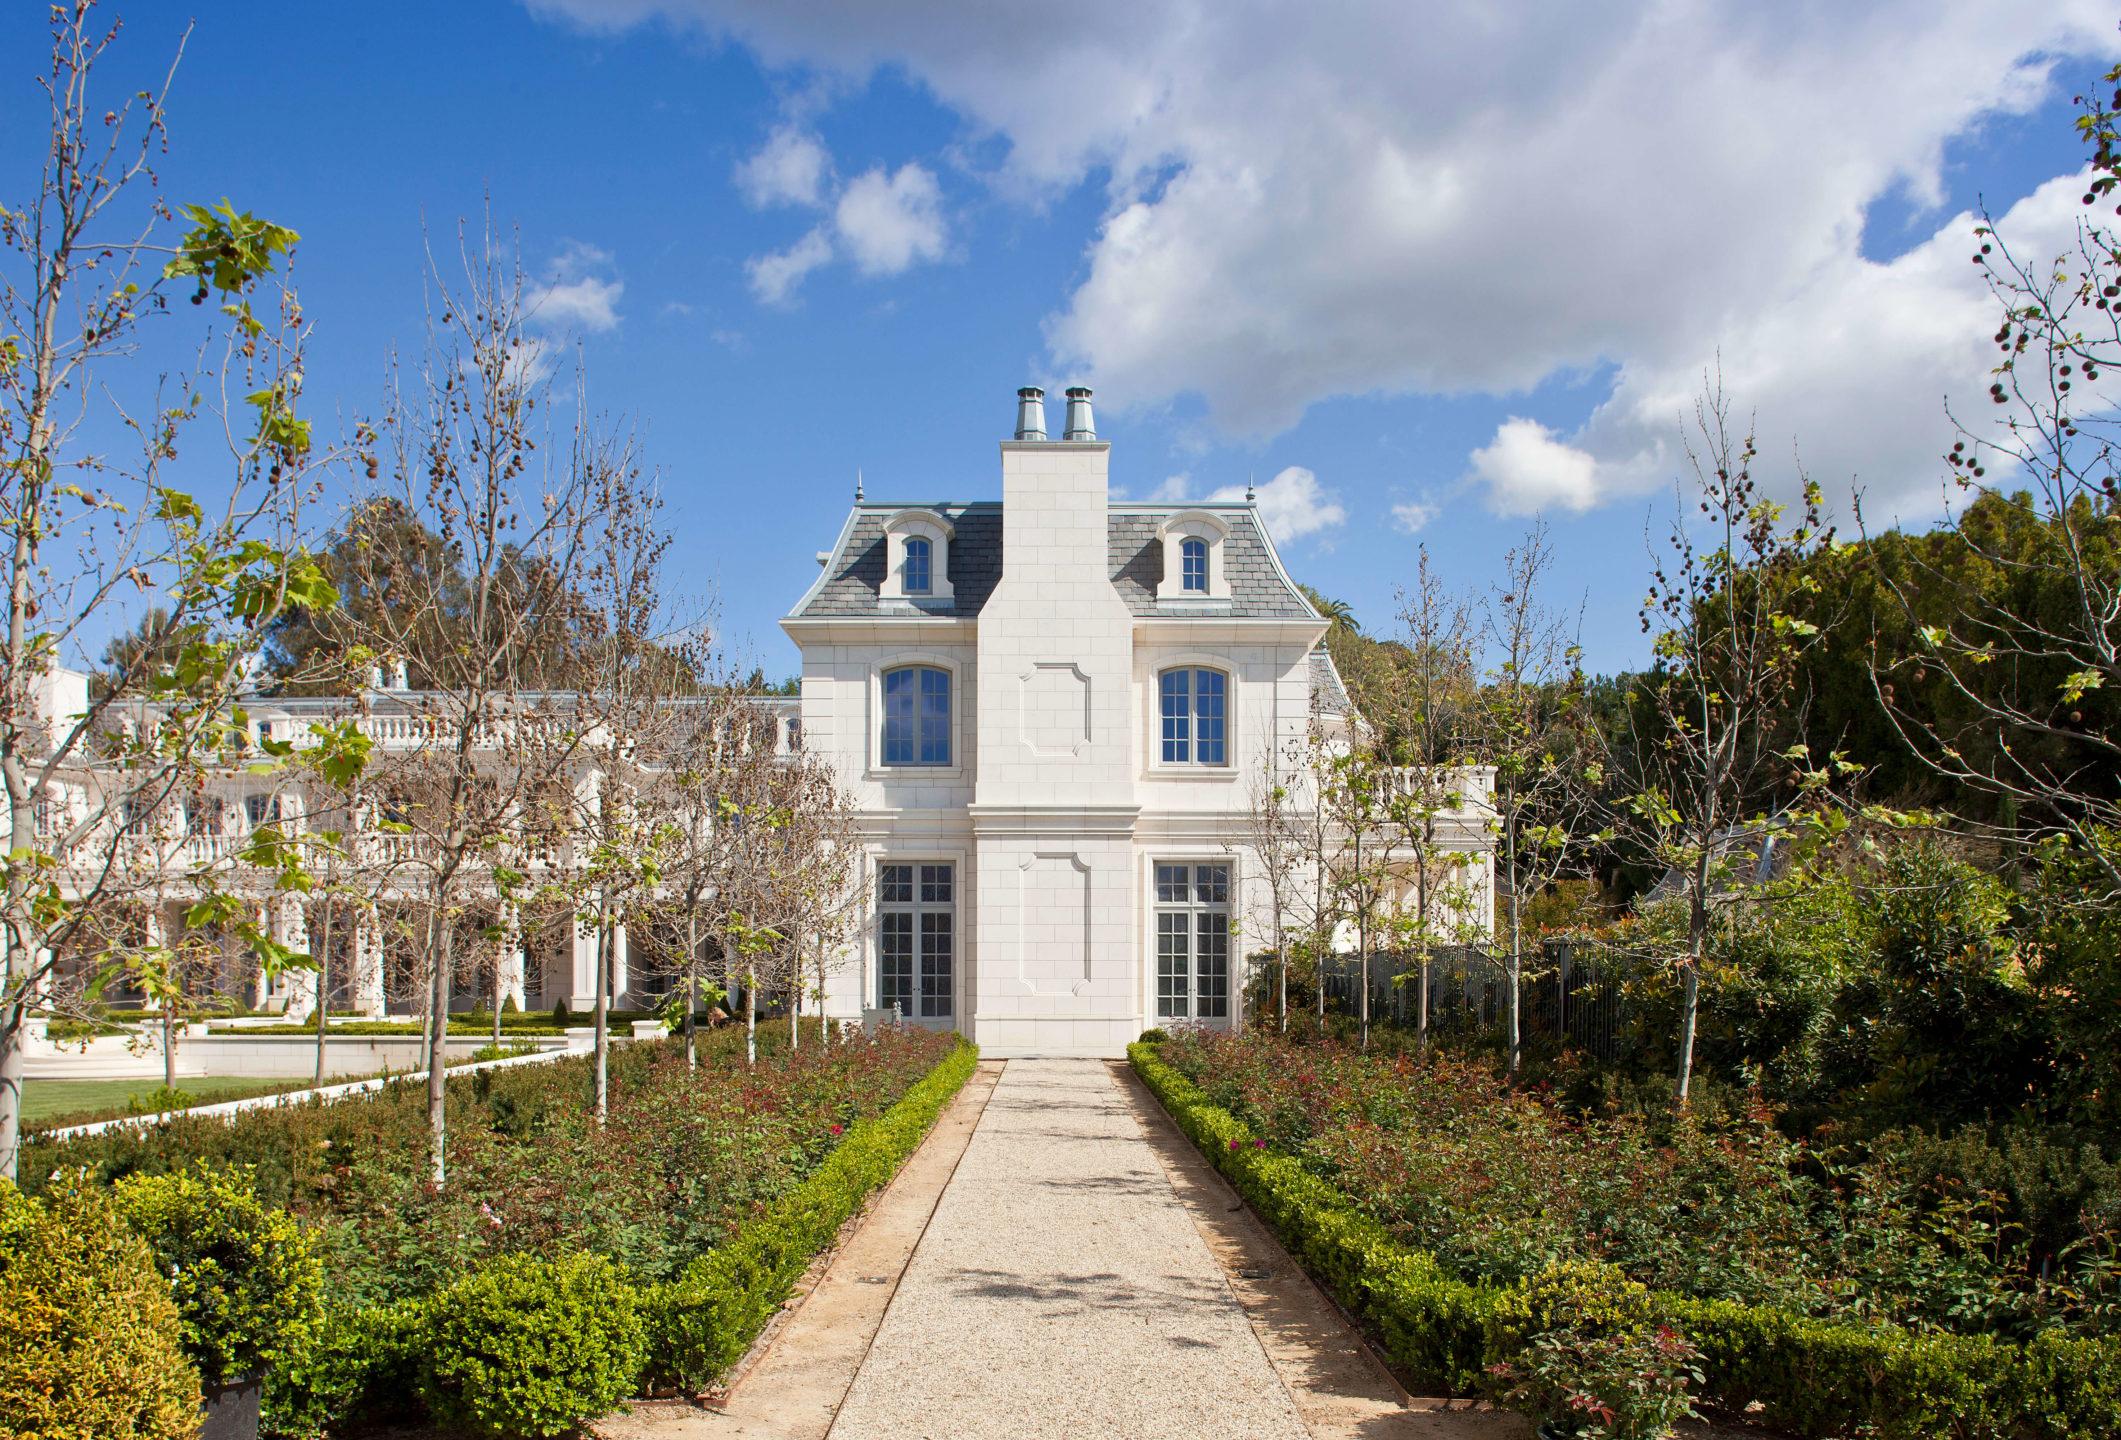 studio-william-hefner-chateau-des-fleurs-32